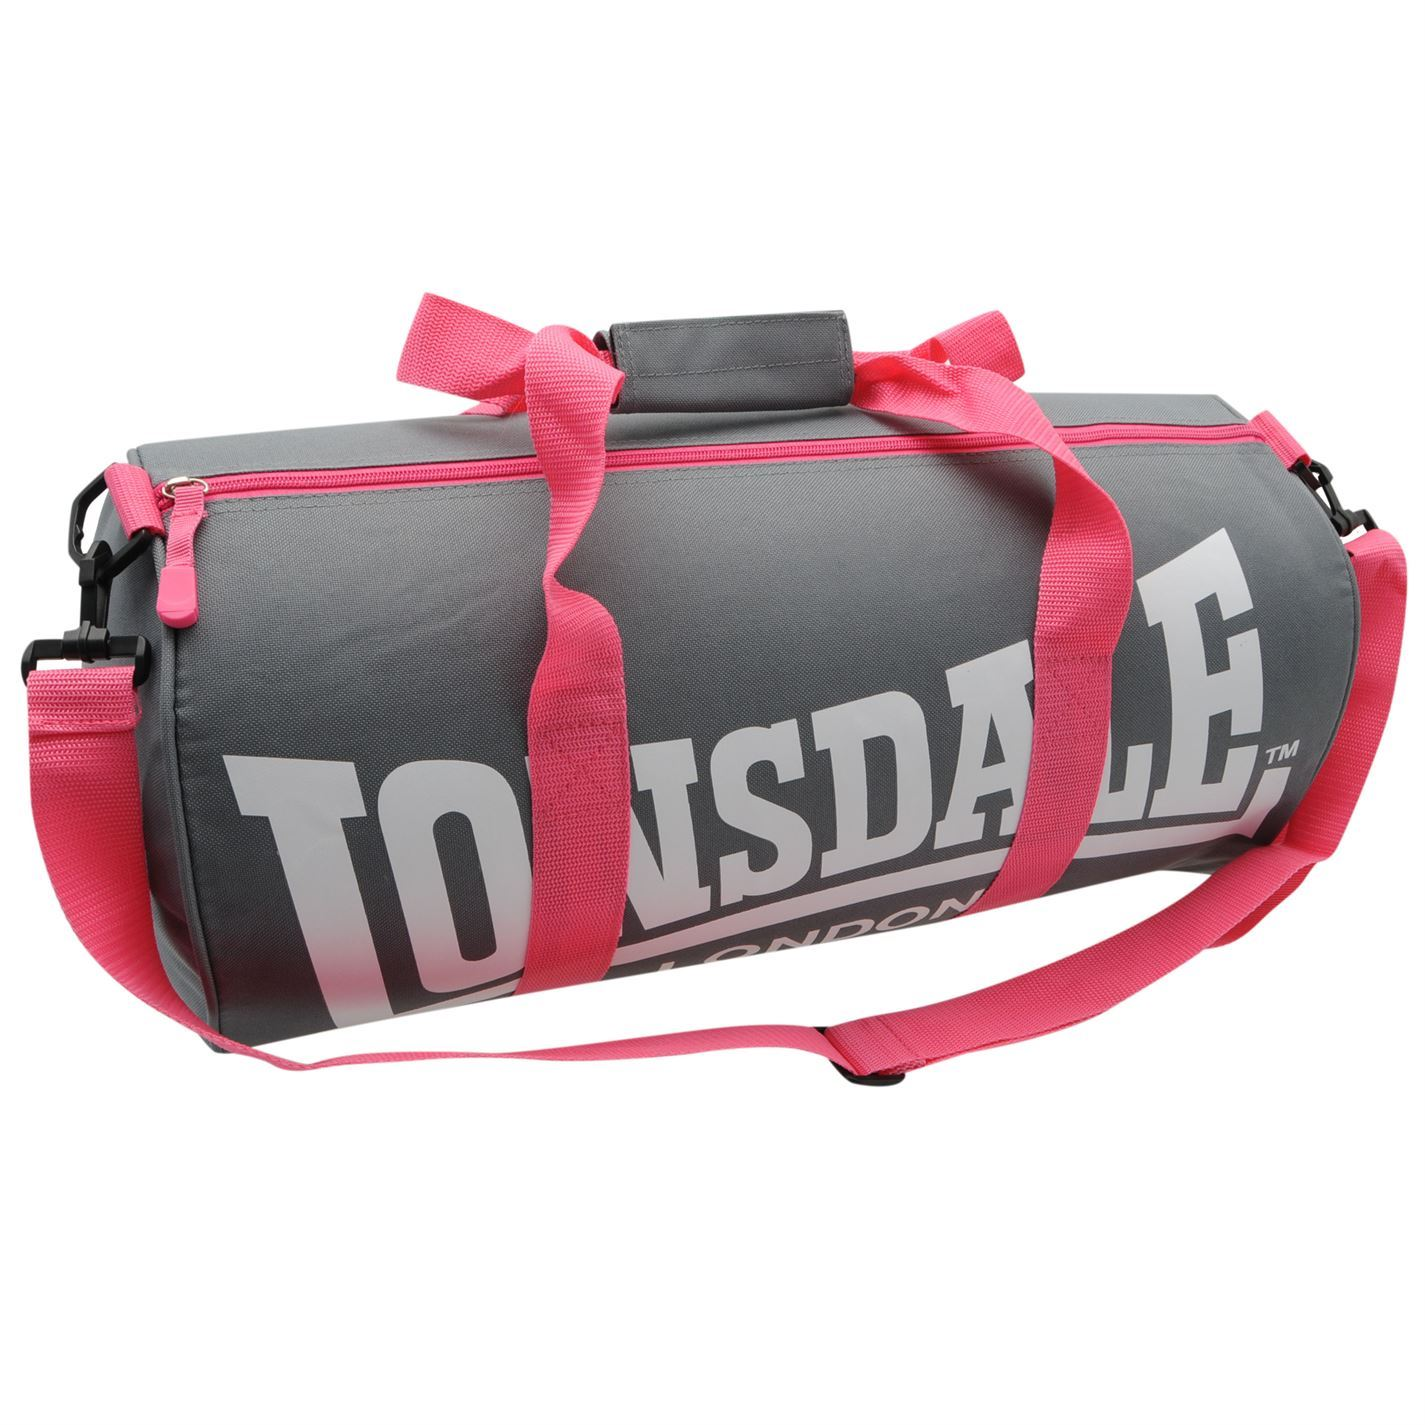 ... LONSDALE London Barrel Bag Holdall Kitbag Gym Sports Duffle f5e8ff8a841ec